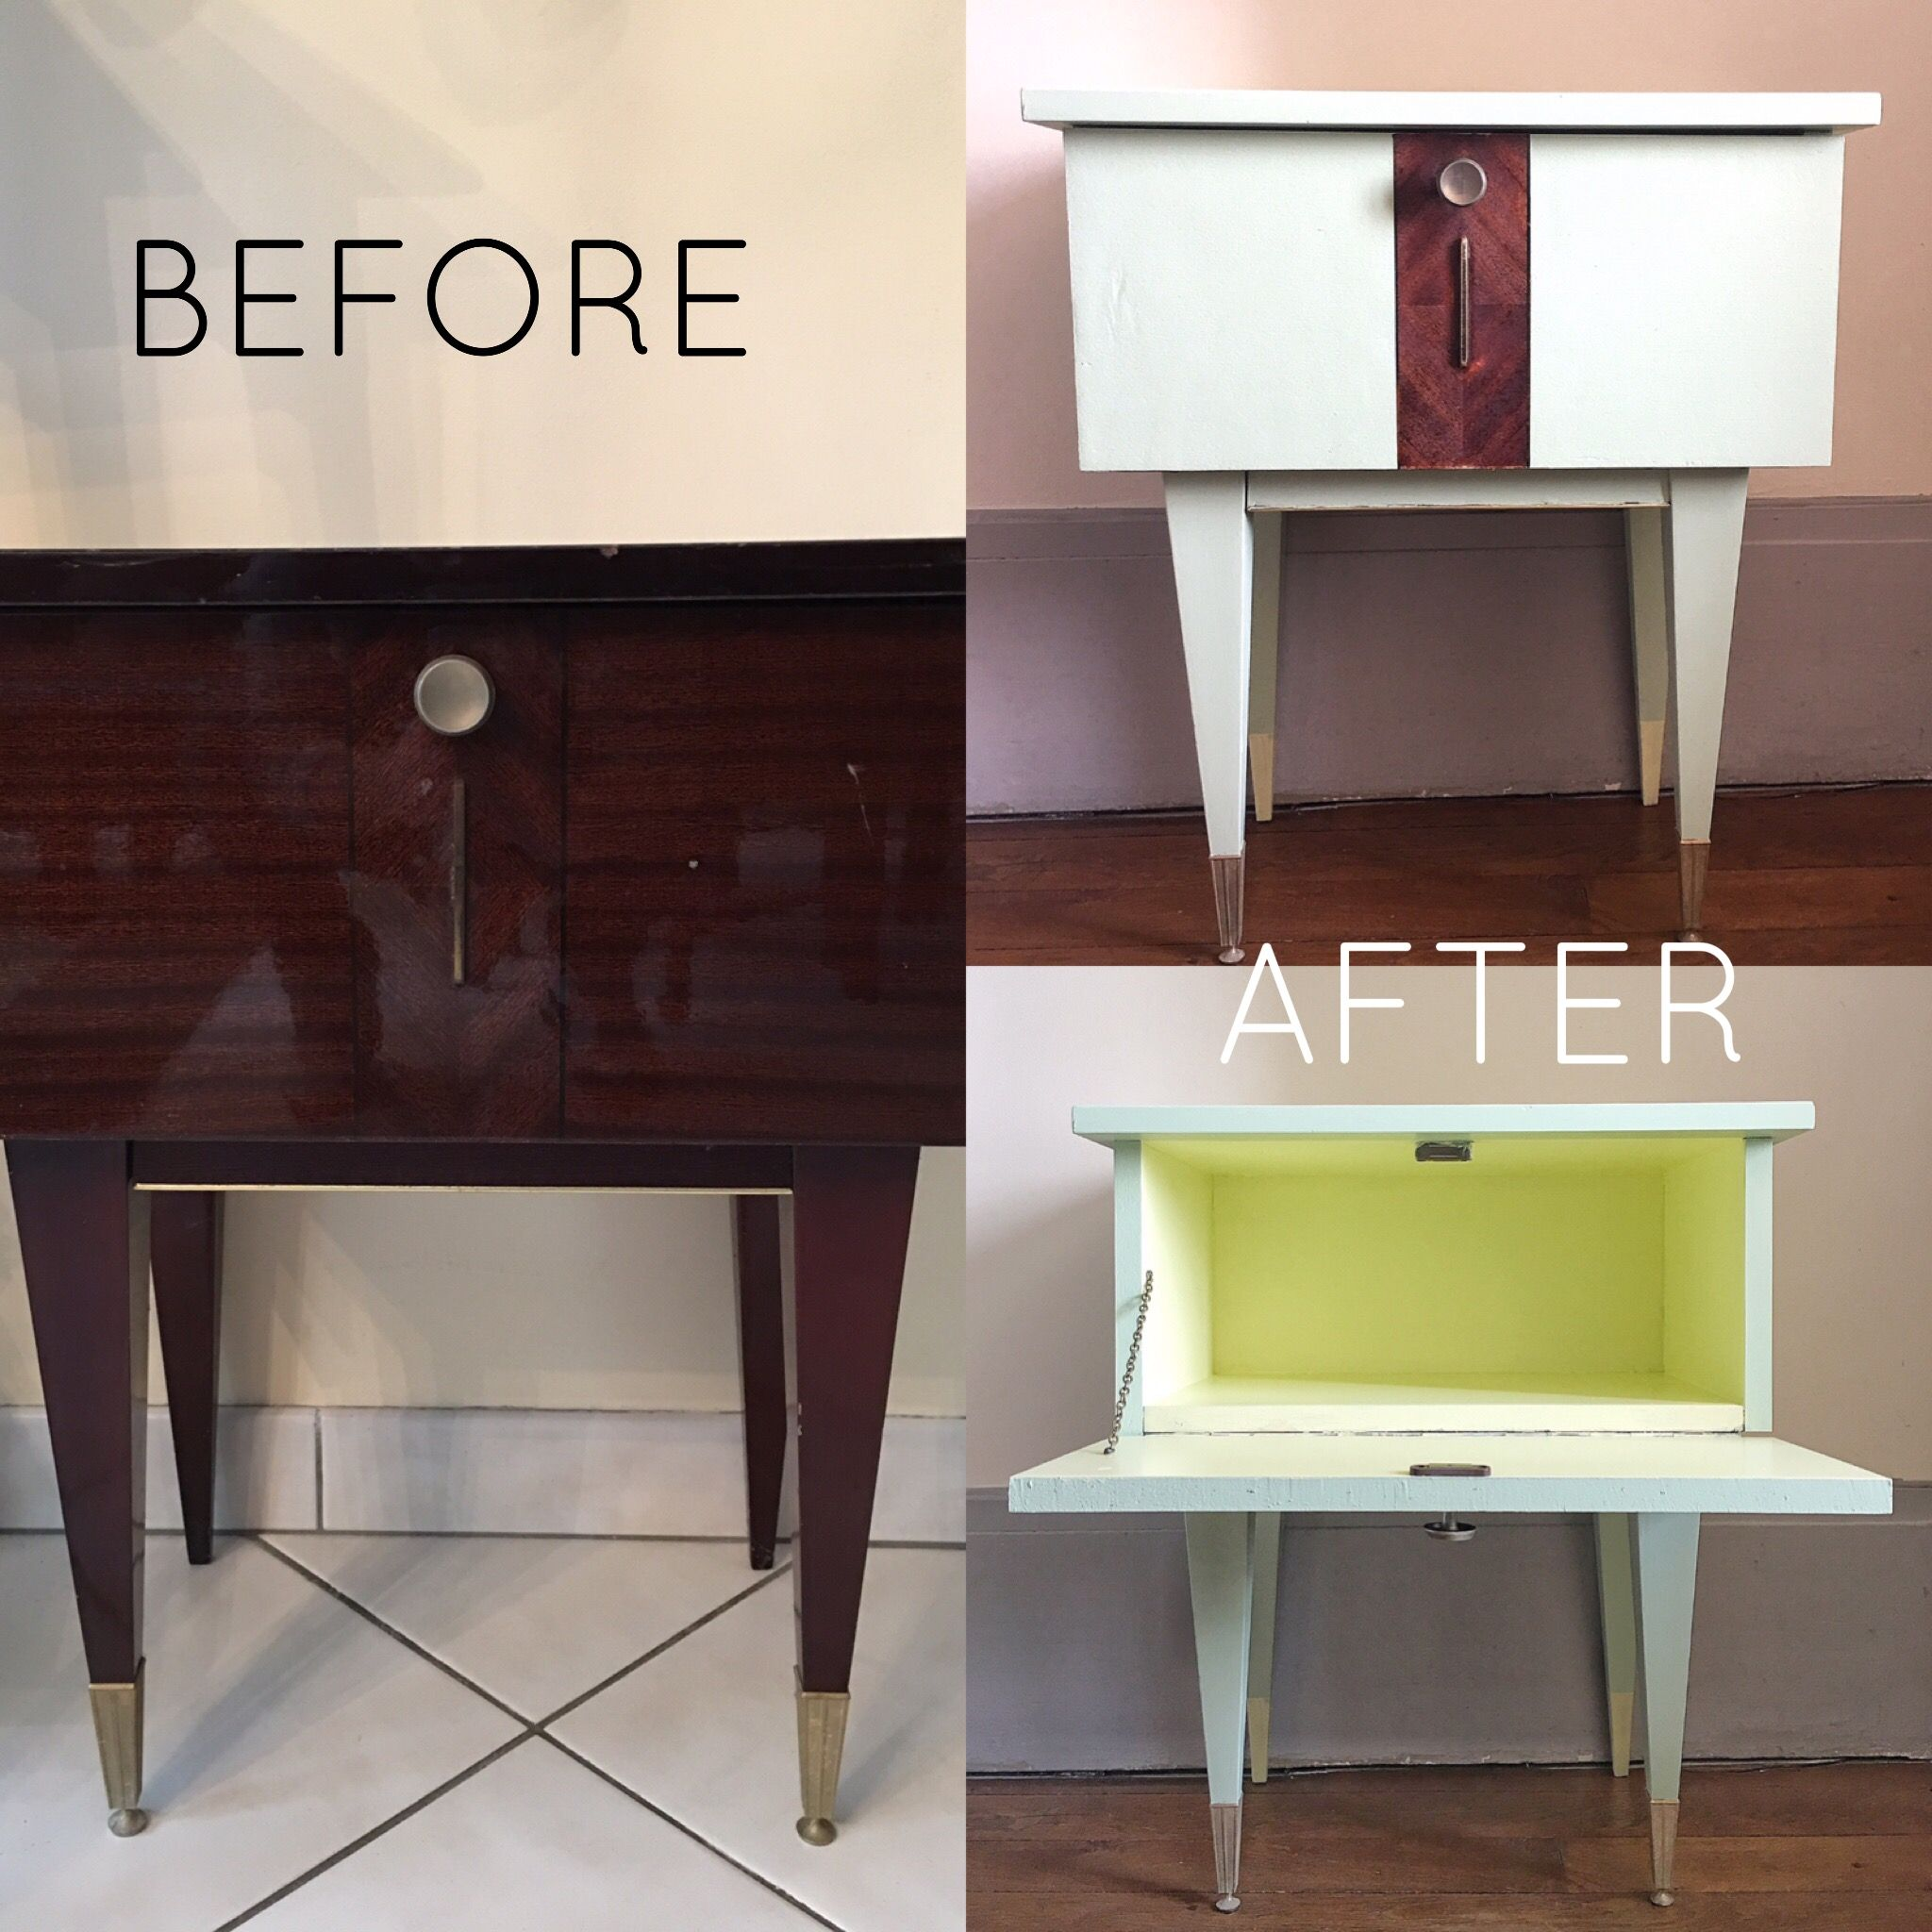 Table de chevet, DIY, do it yourself, furniture